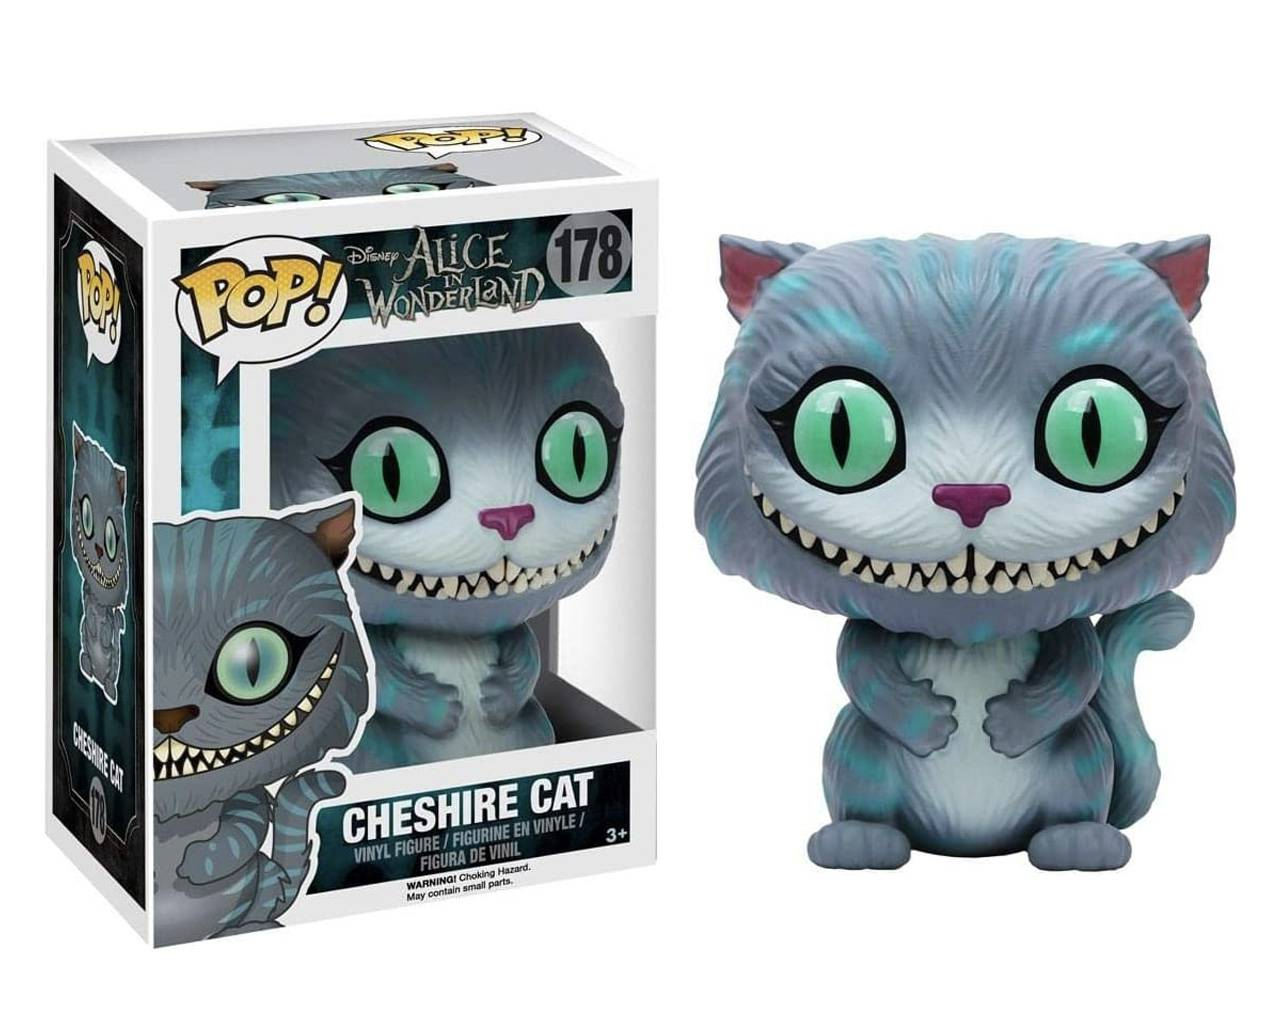 Cheshire Cat (Movie) Pop! Vinyl